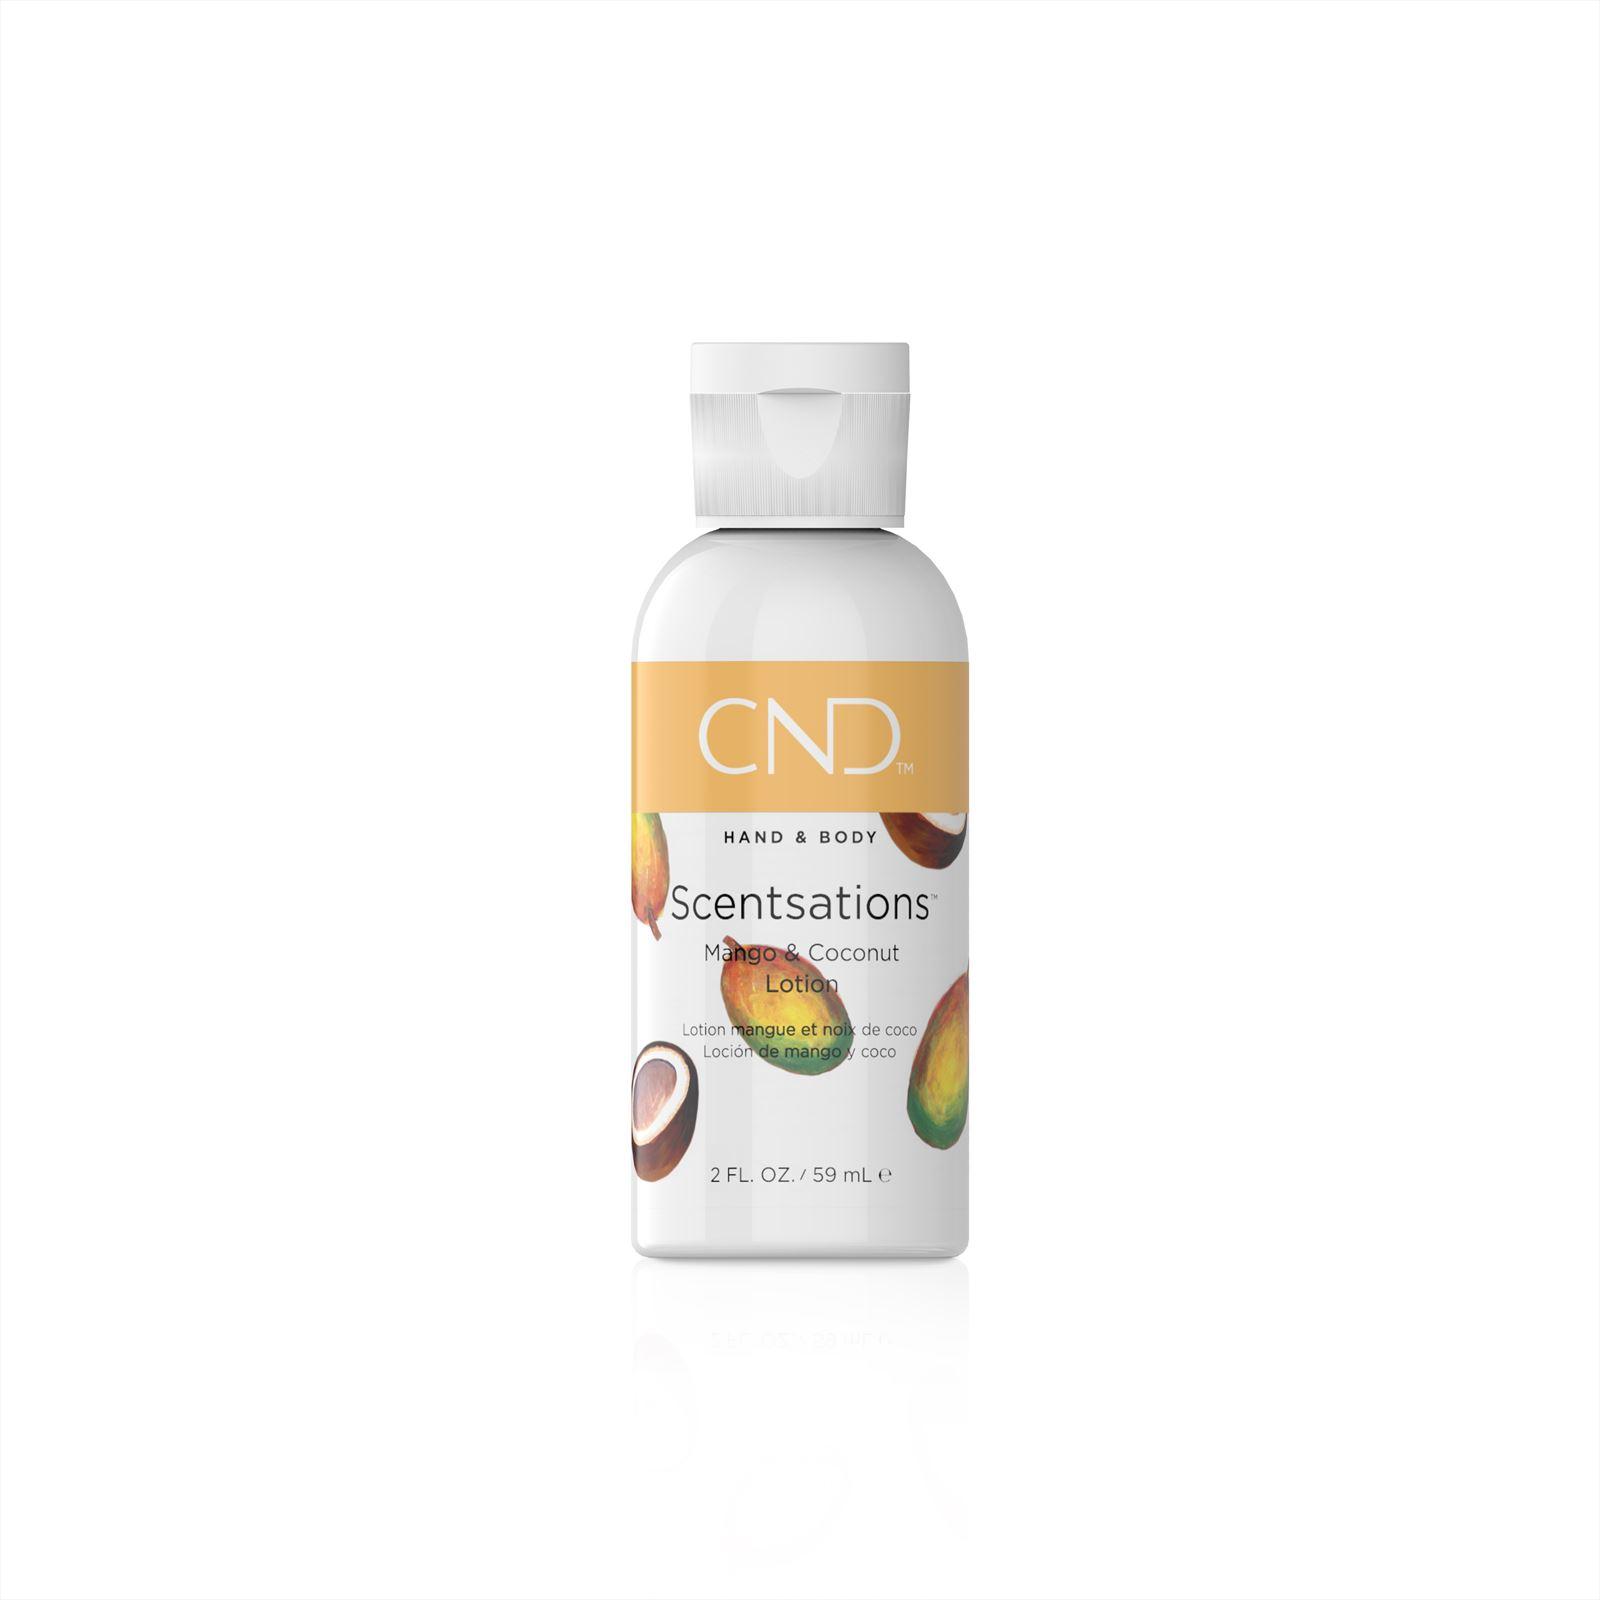 Afbeelding van CND ™ Scentsations Lotion - Mango & Coconut 59 ml